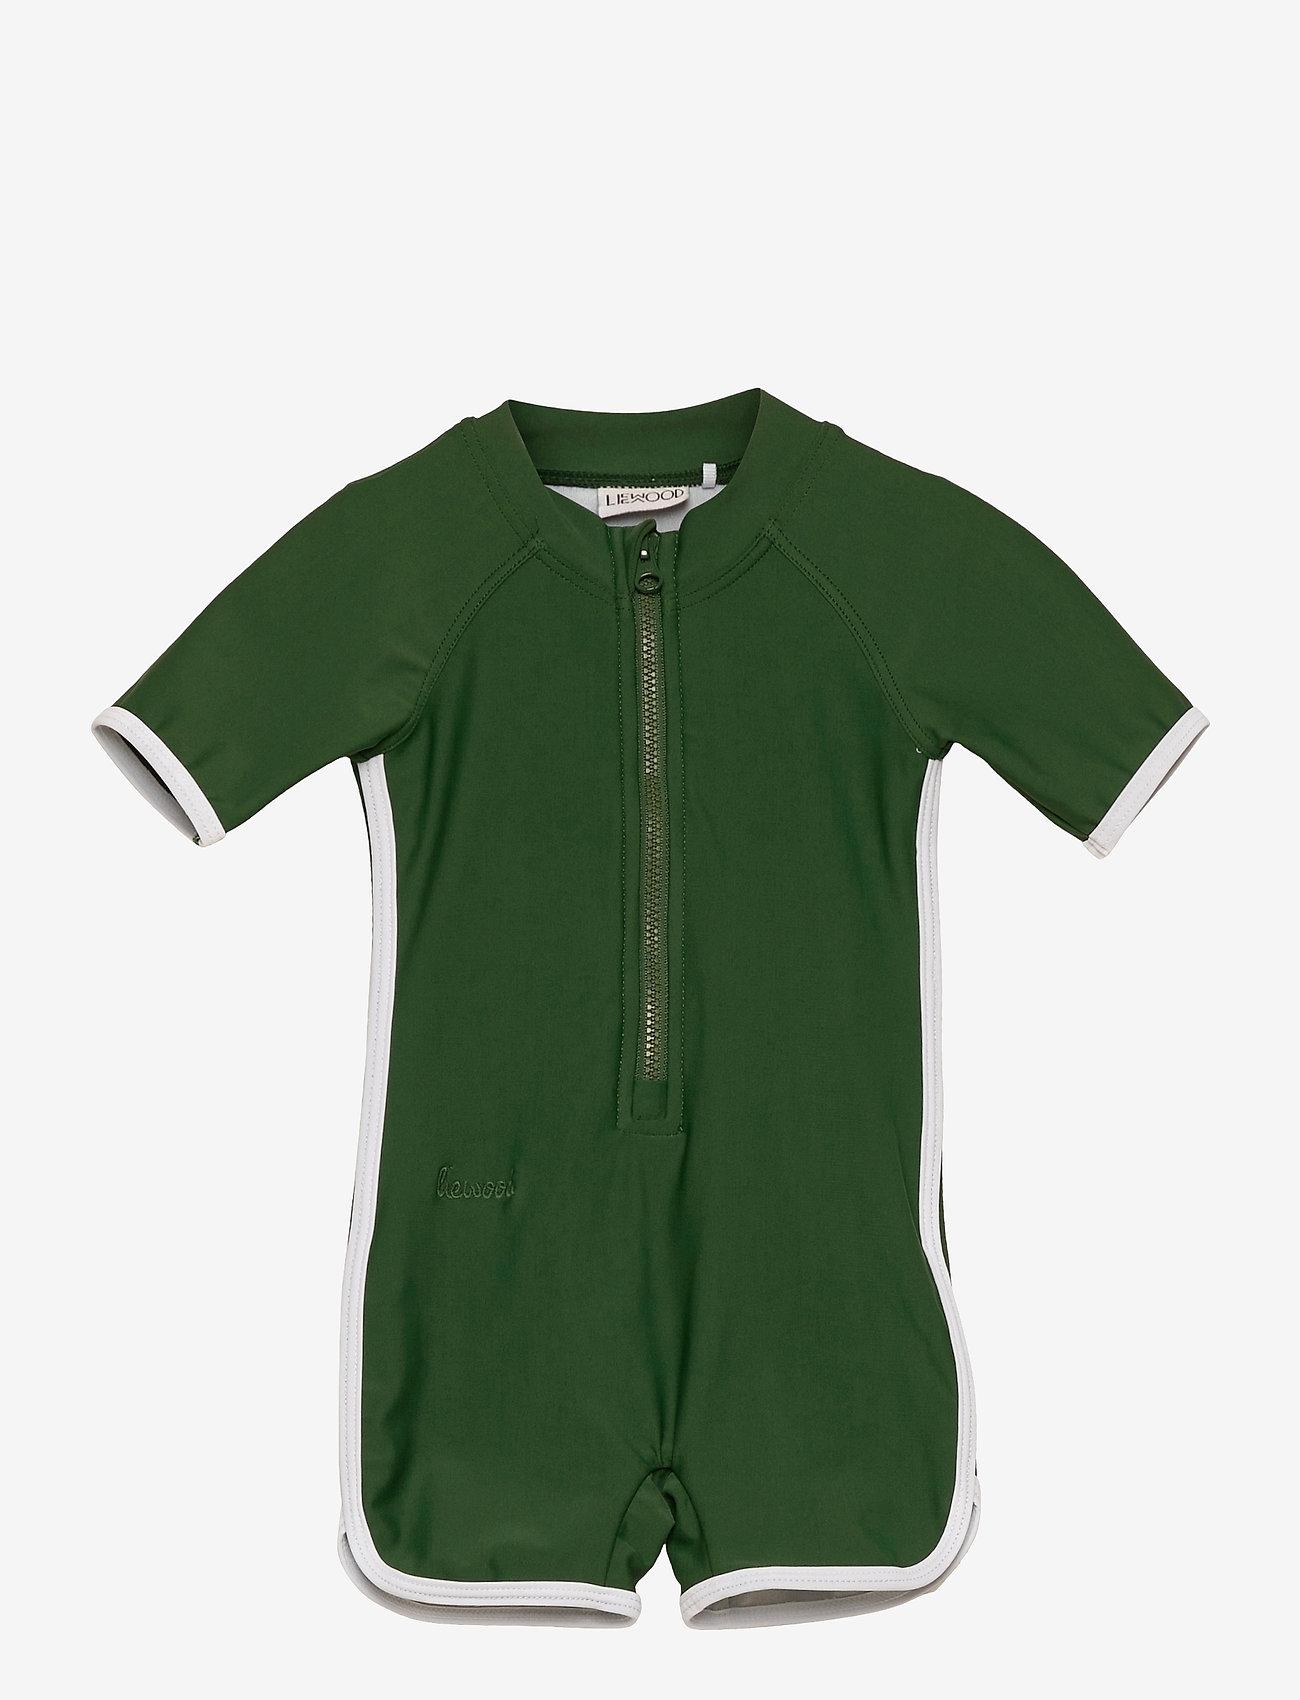 Liewood - Triton swim jumpsuit - swimsuits - garden green - 0